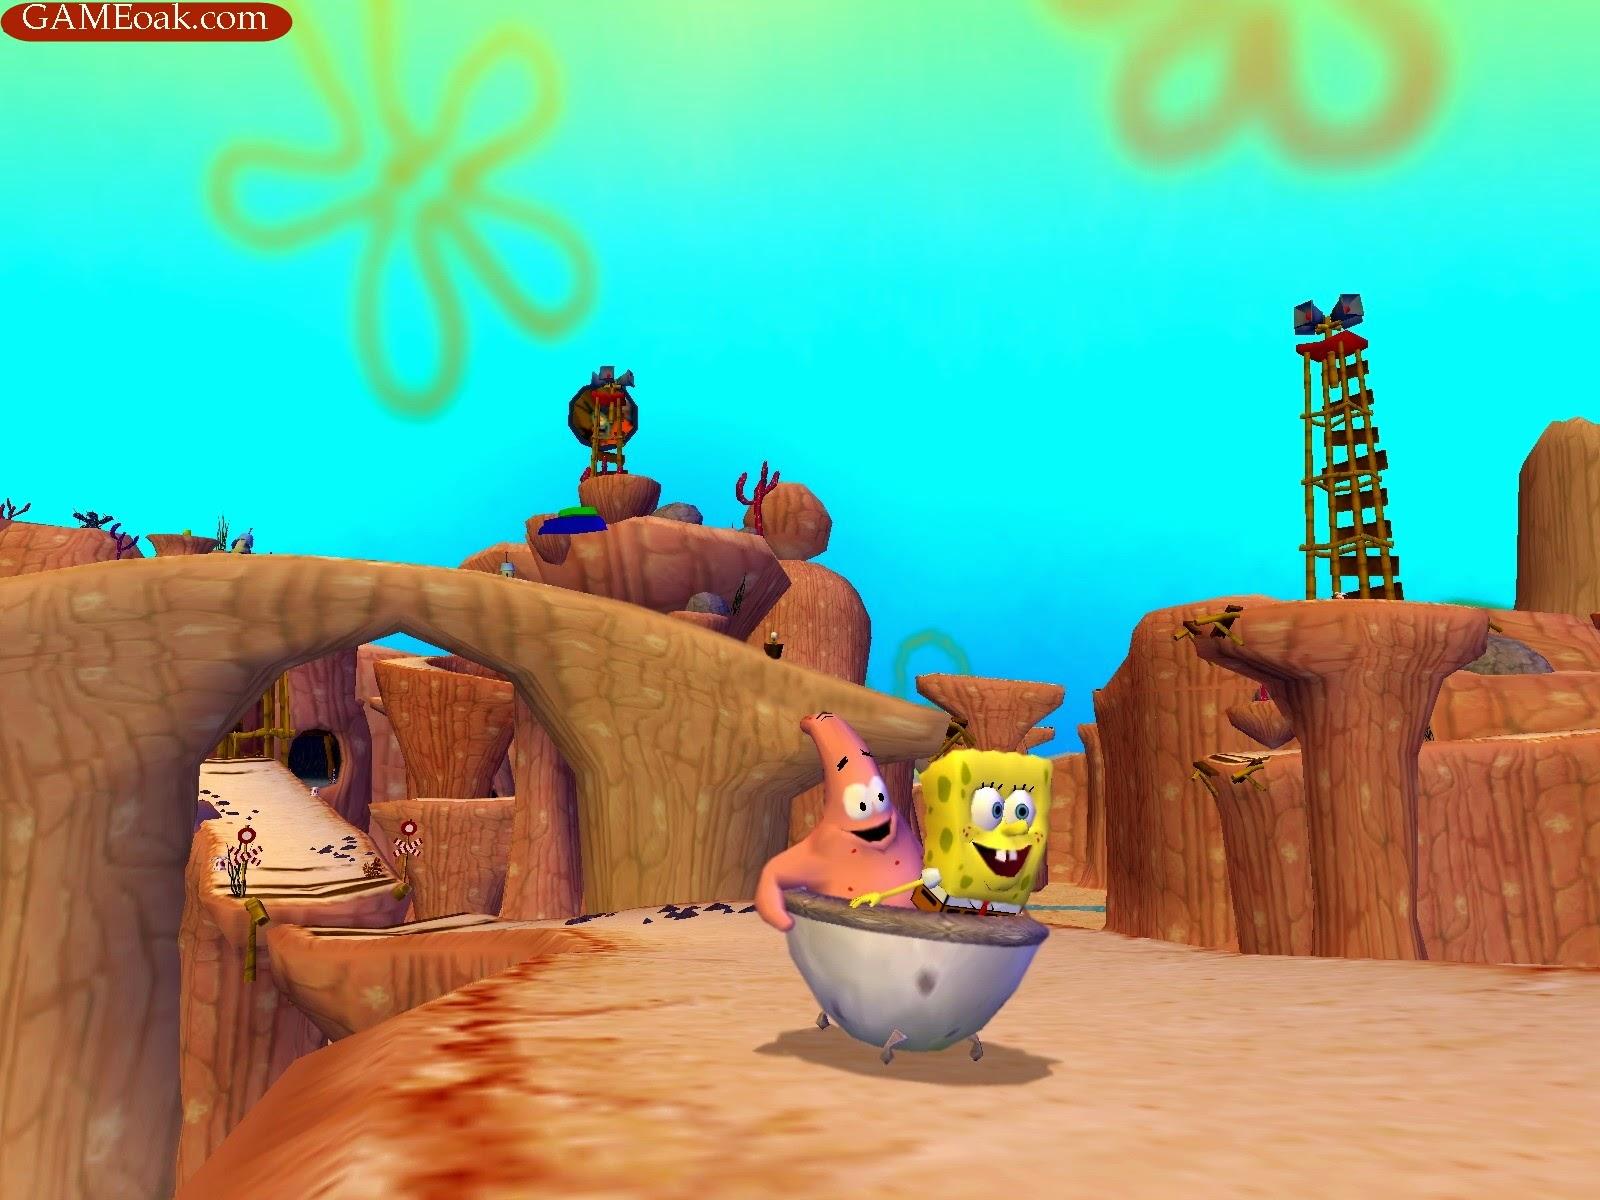 The Spongebob Squarepants movie Game ~ Download Free Games ...